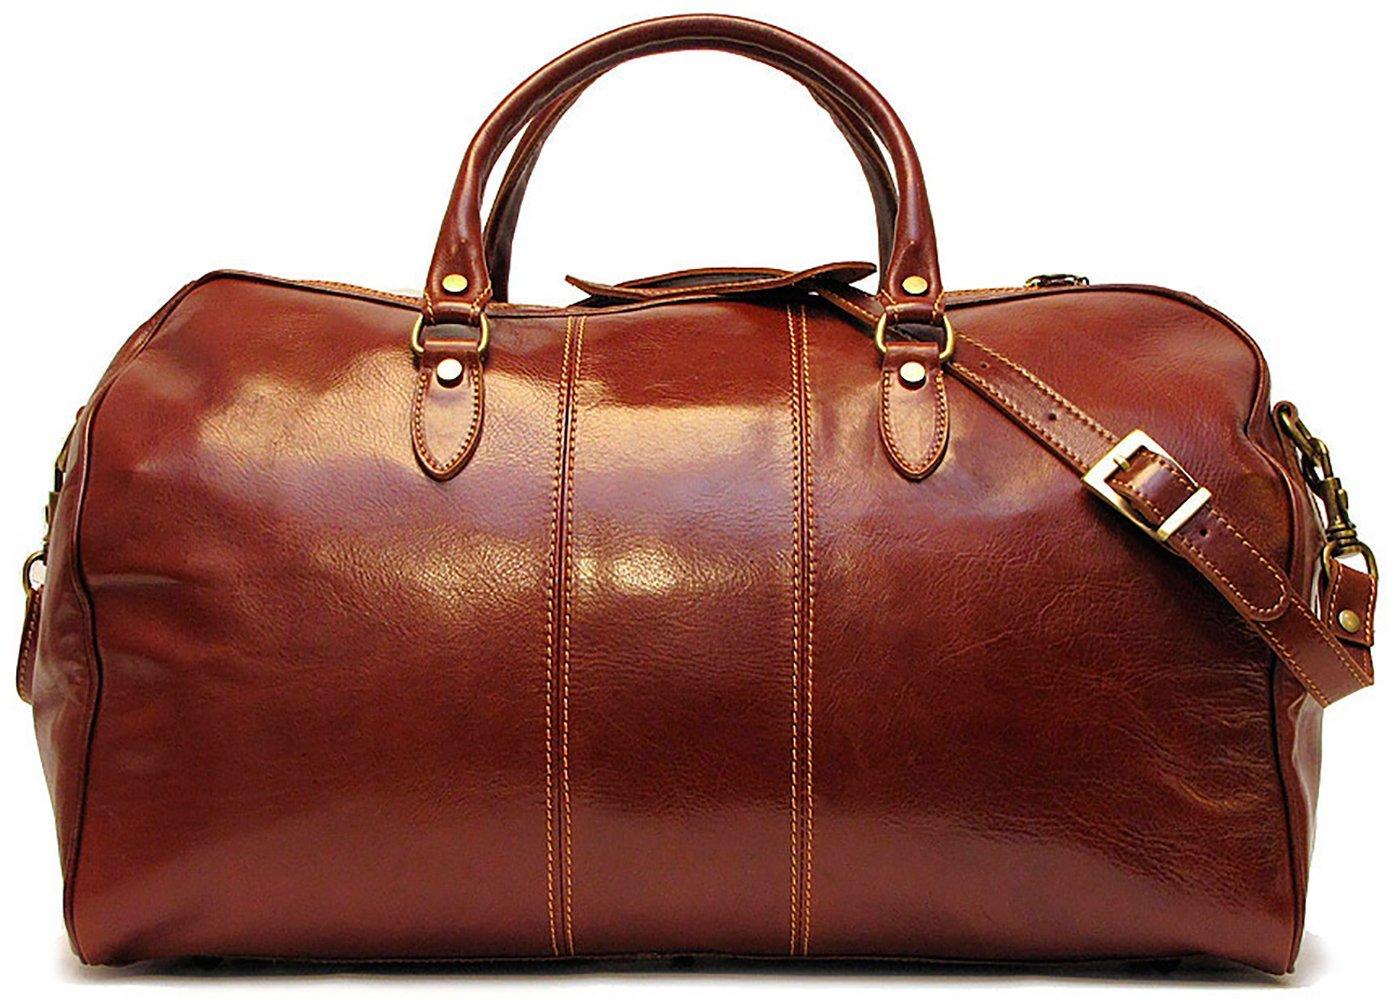 Floto Unisex [Personalized Initials Embossing] Venezia Leather Duffel Bag in Brown